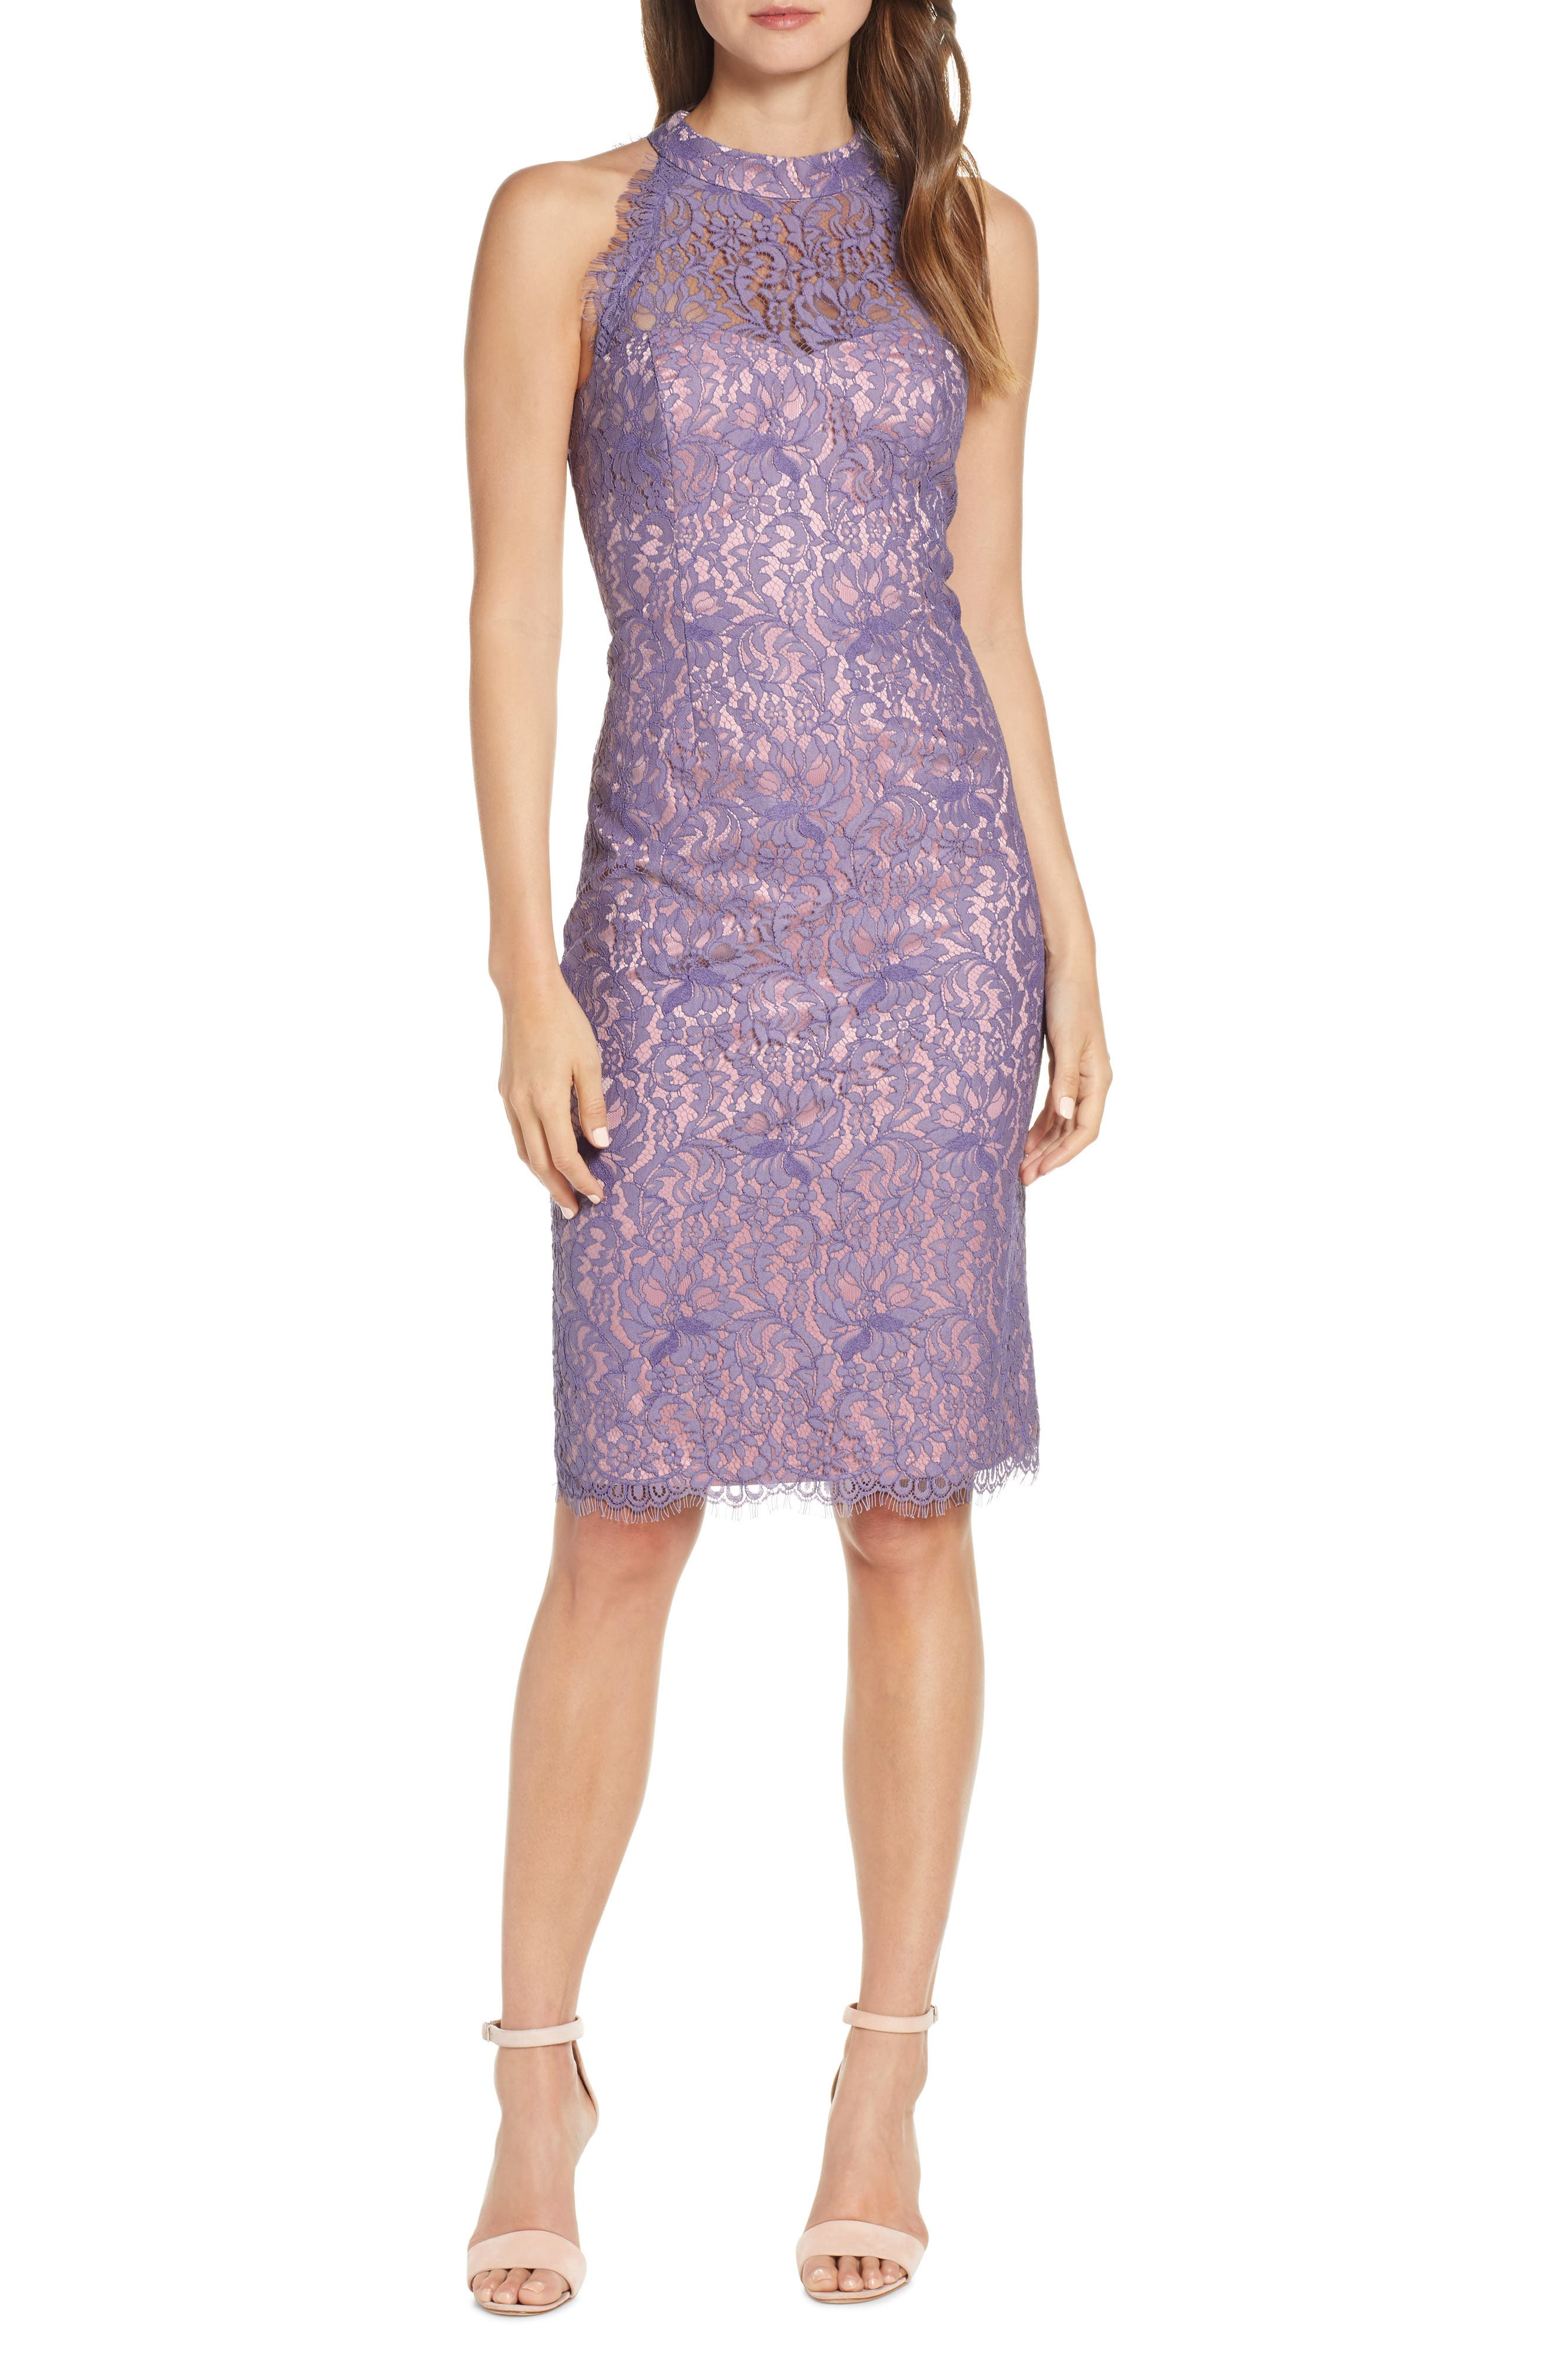 Lilac Halter Sheath Dress